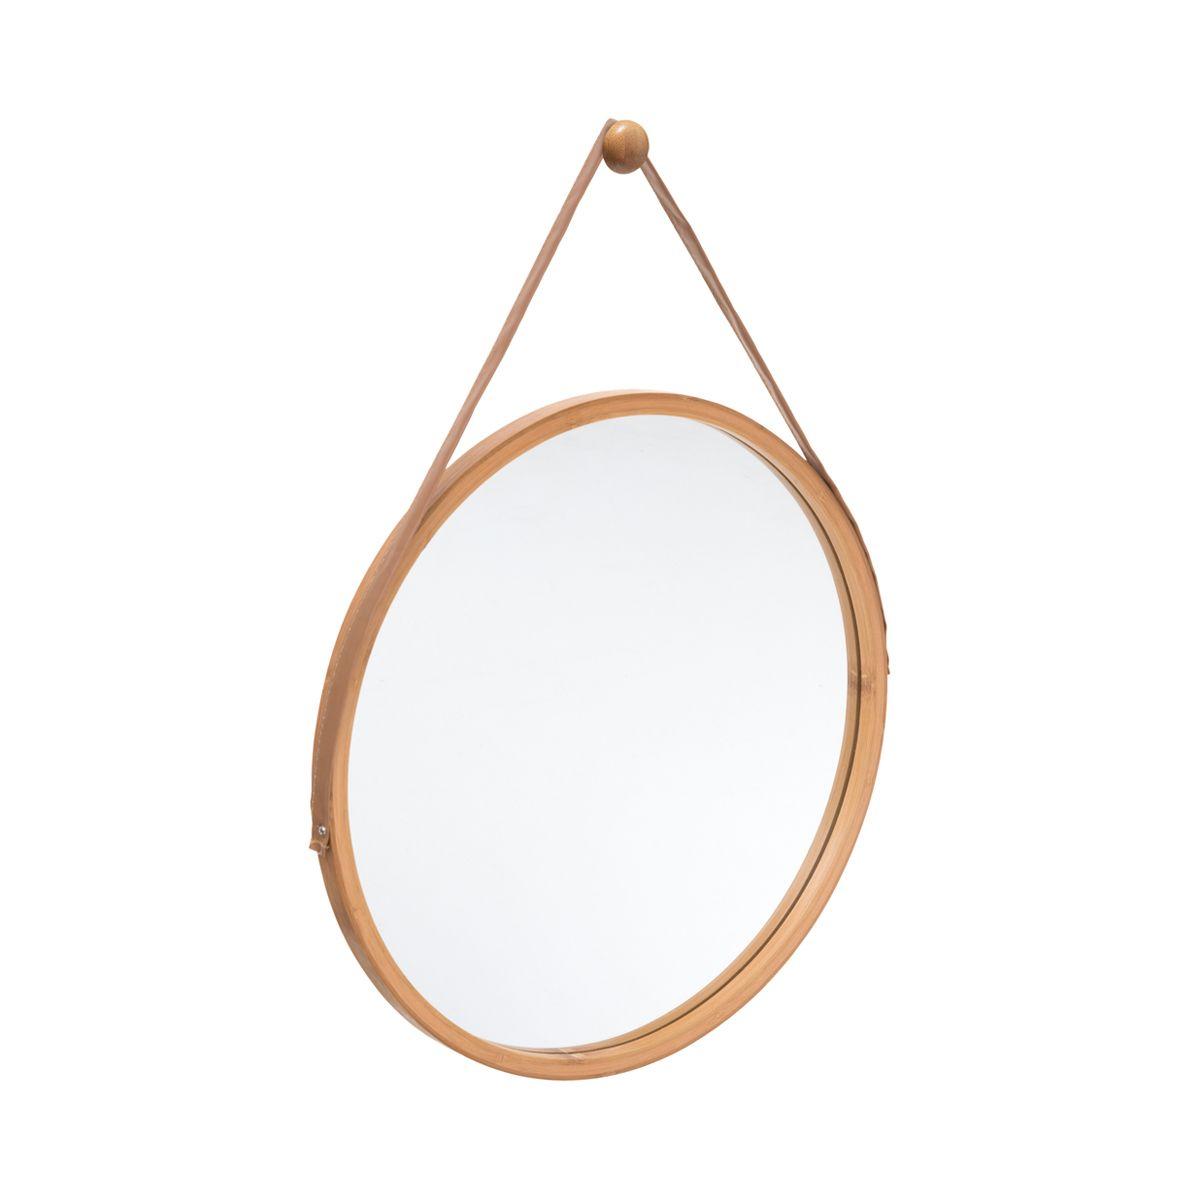 Miroir rond en bambou anse en cuir